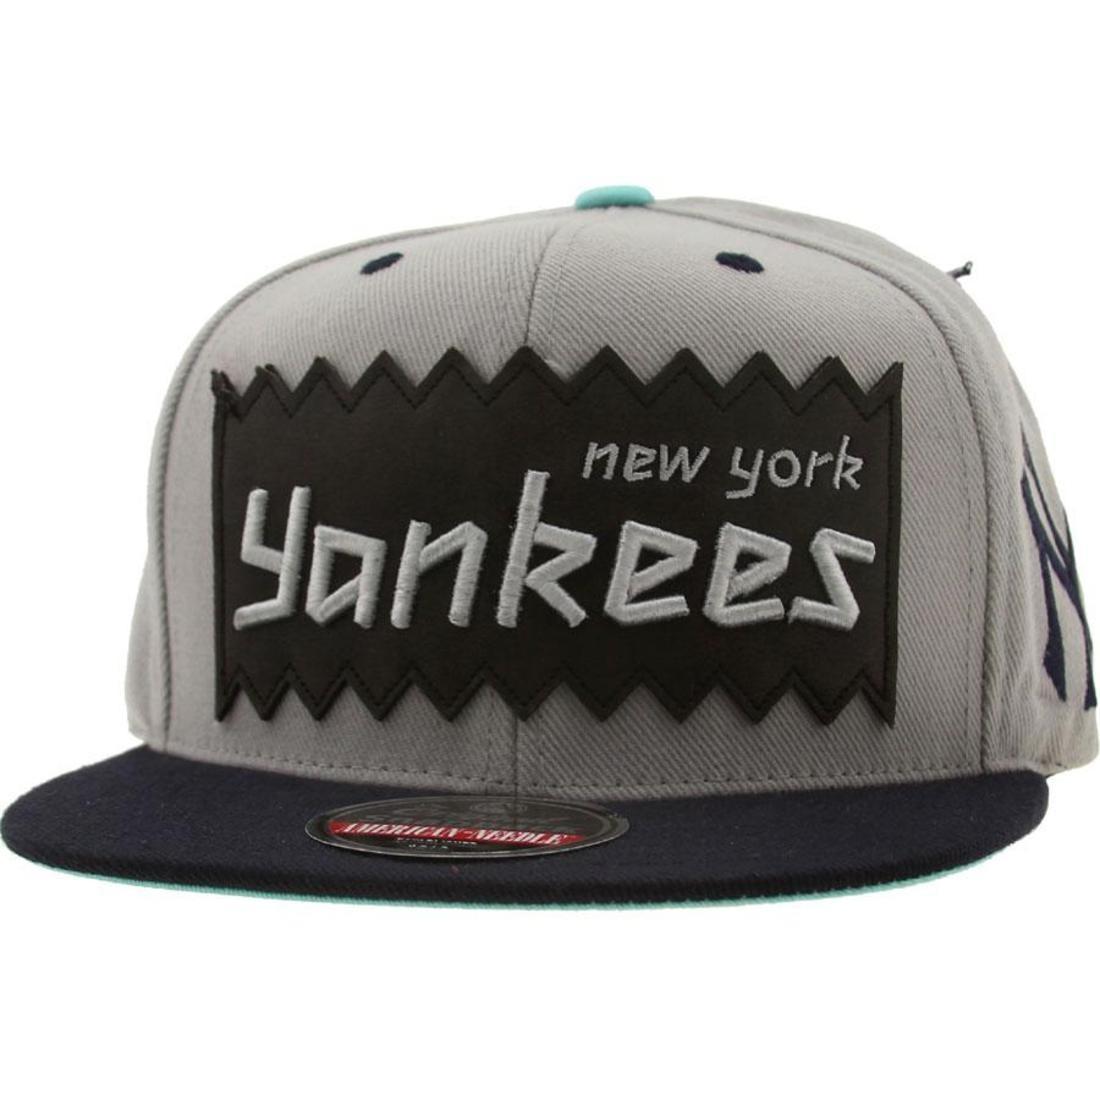 promo code 3fffa 12f2d ... sale bait x mlb x american needle new york yankees retro snapback cap  silver navy bb4be